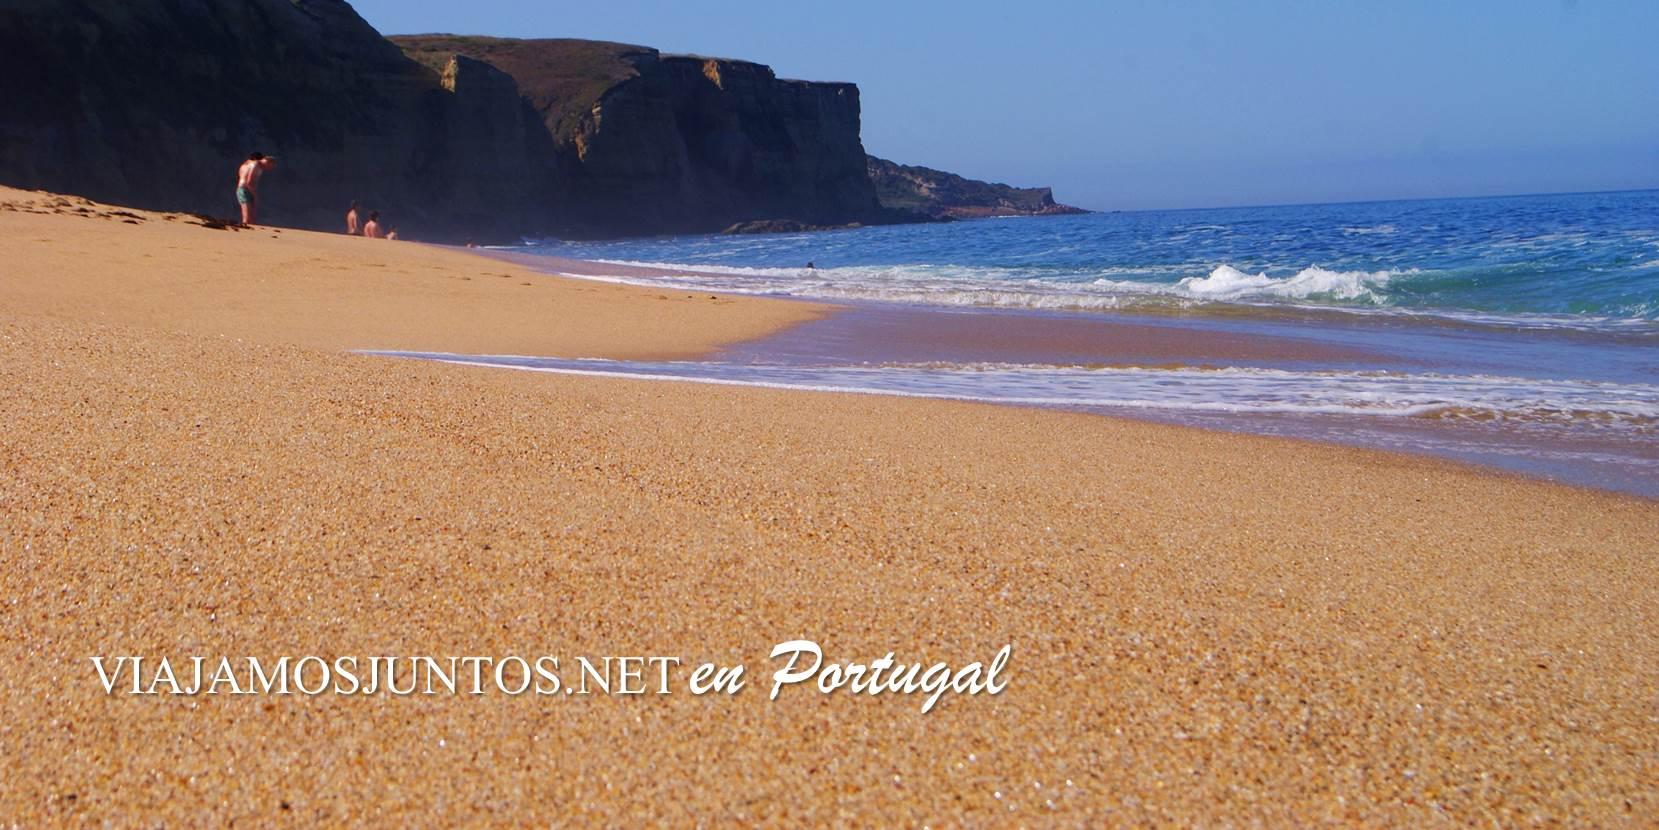 Playa do Meco, Costa Caparica, Portugal